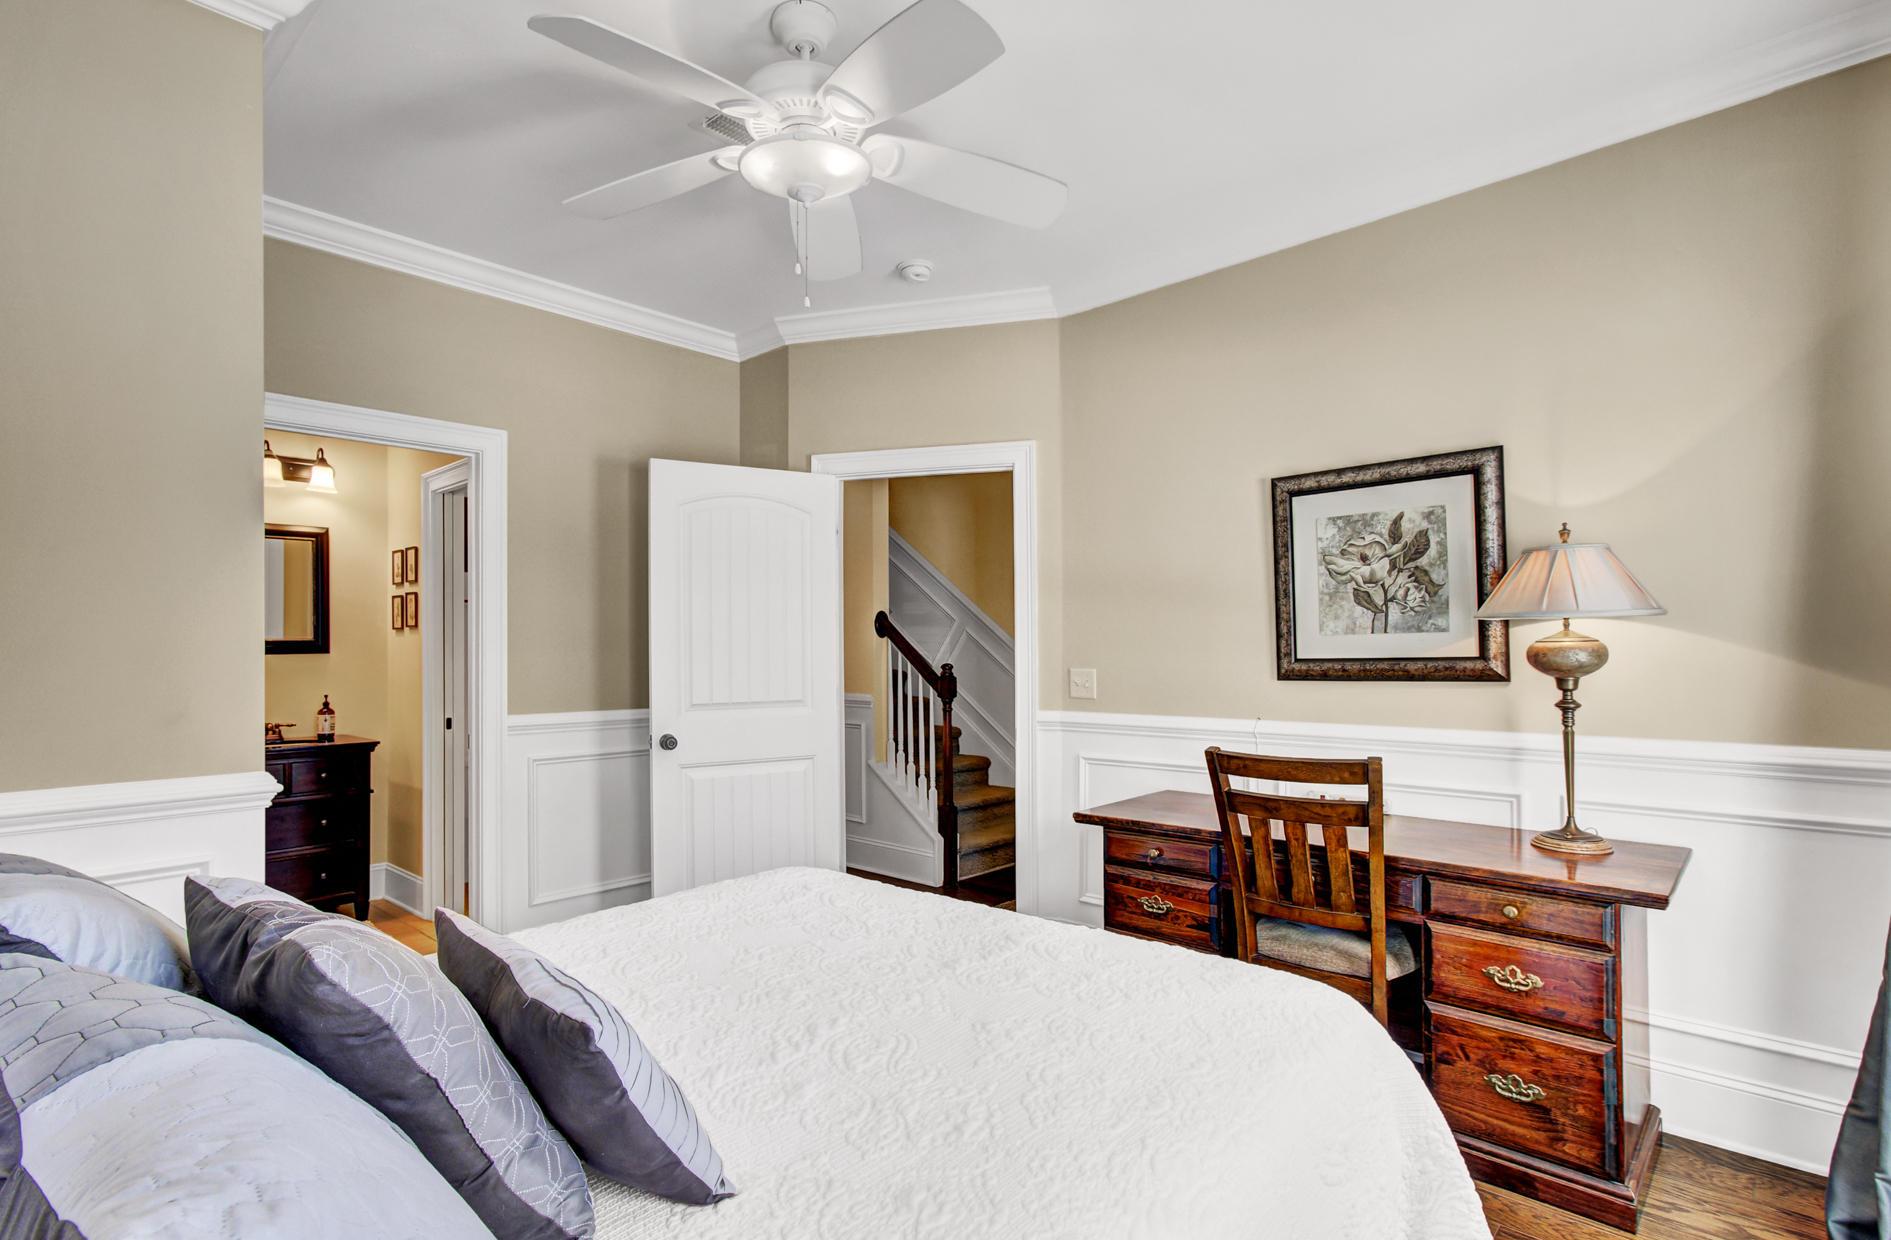 Carol Oaks Town Homes Homes For Sale - 2956 Emma, Mount Pleasant, SC - 28